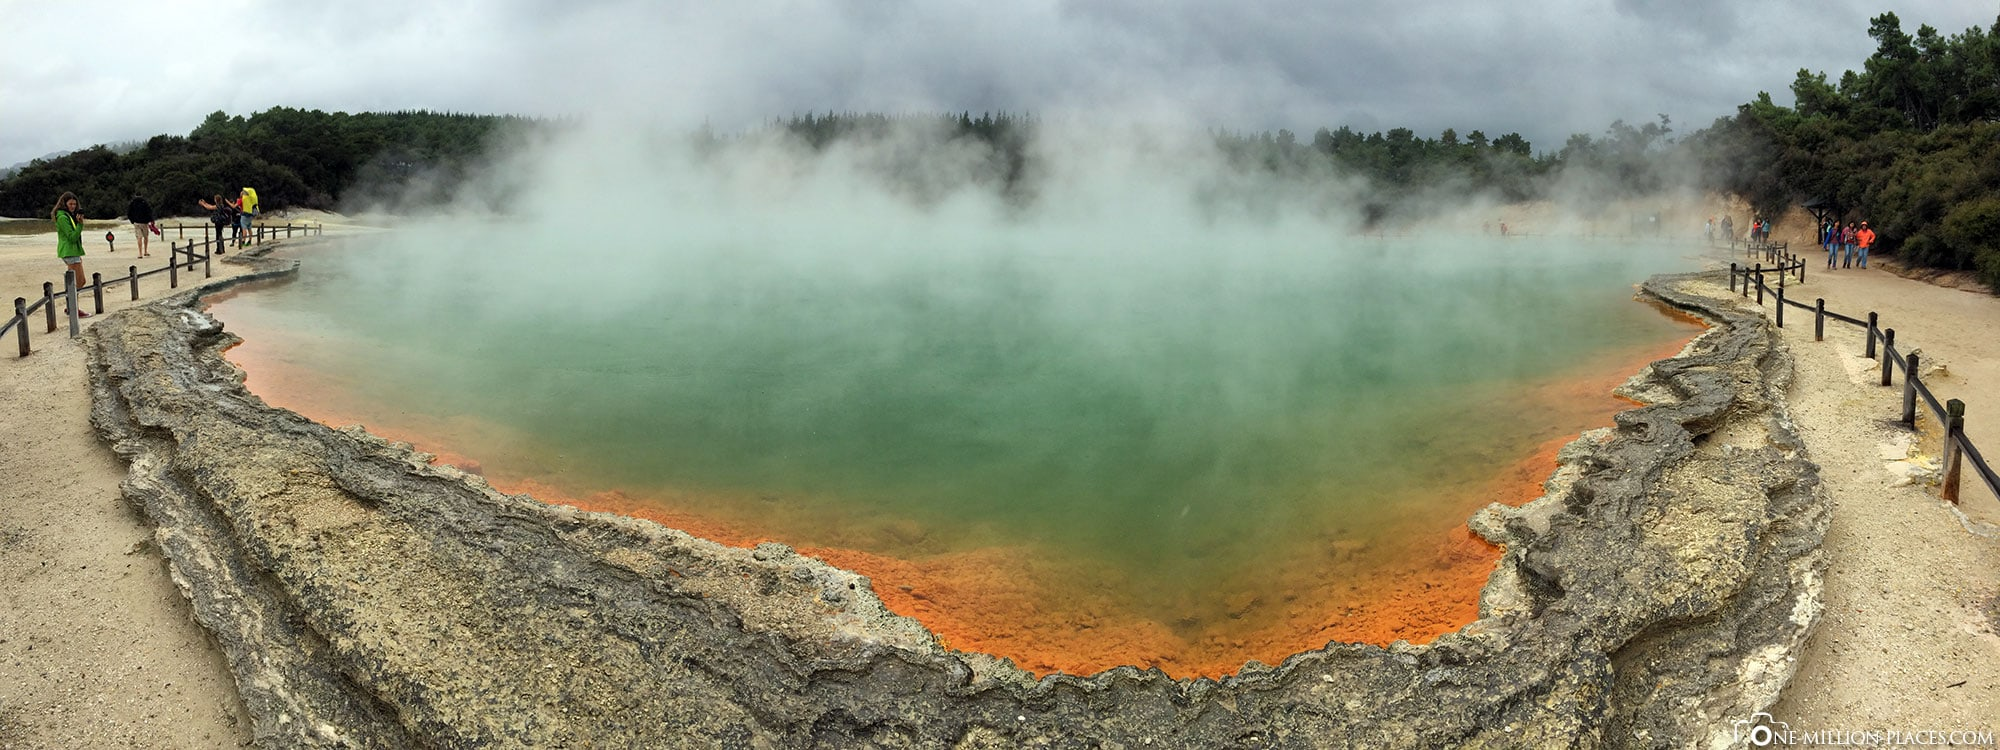 Panorama, Wai-O-Tapu, Waiotapu, Neuseeland, Geothermalgebiet, Region Waikato, Auf eigene Faust, Reisebericht